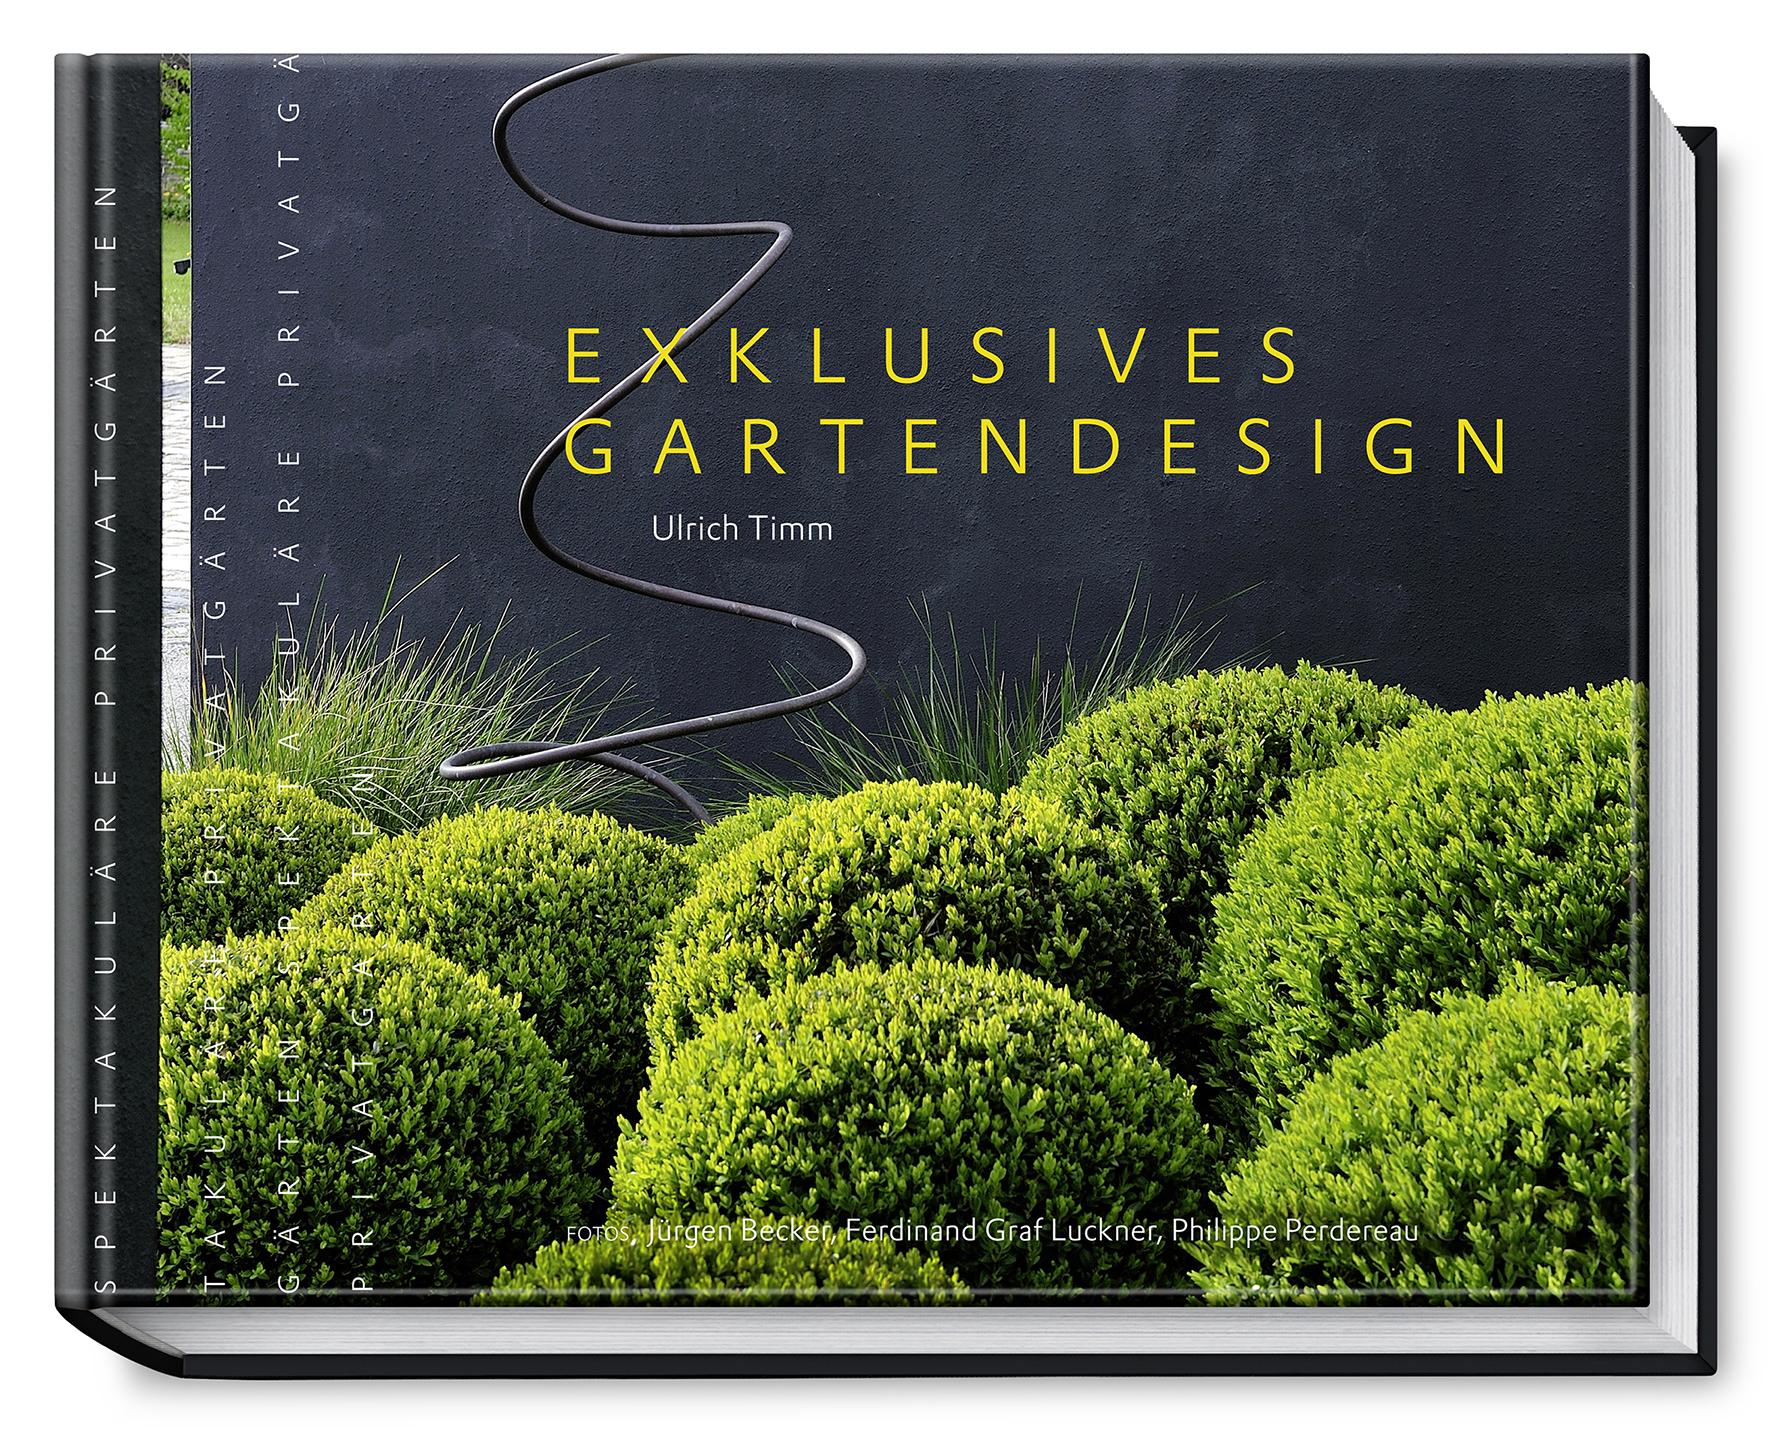 Exklusives Gartendesign Spektakuläre Privatgärten